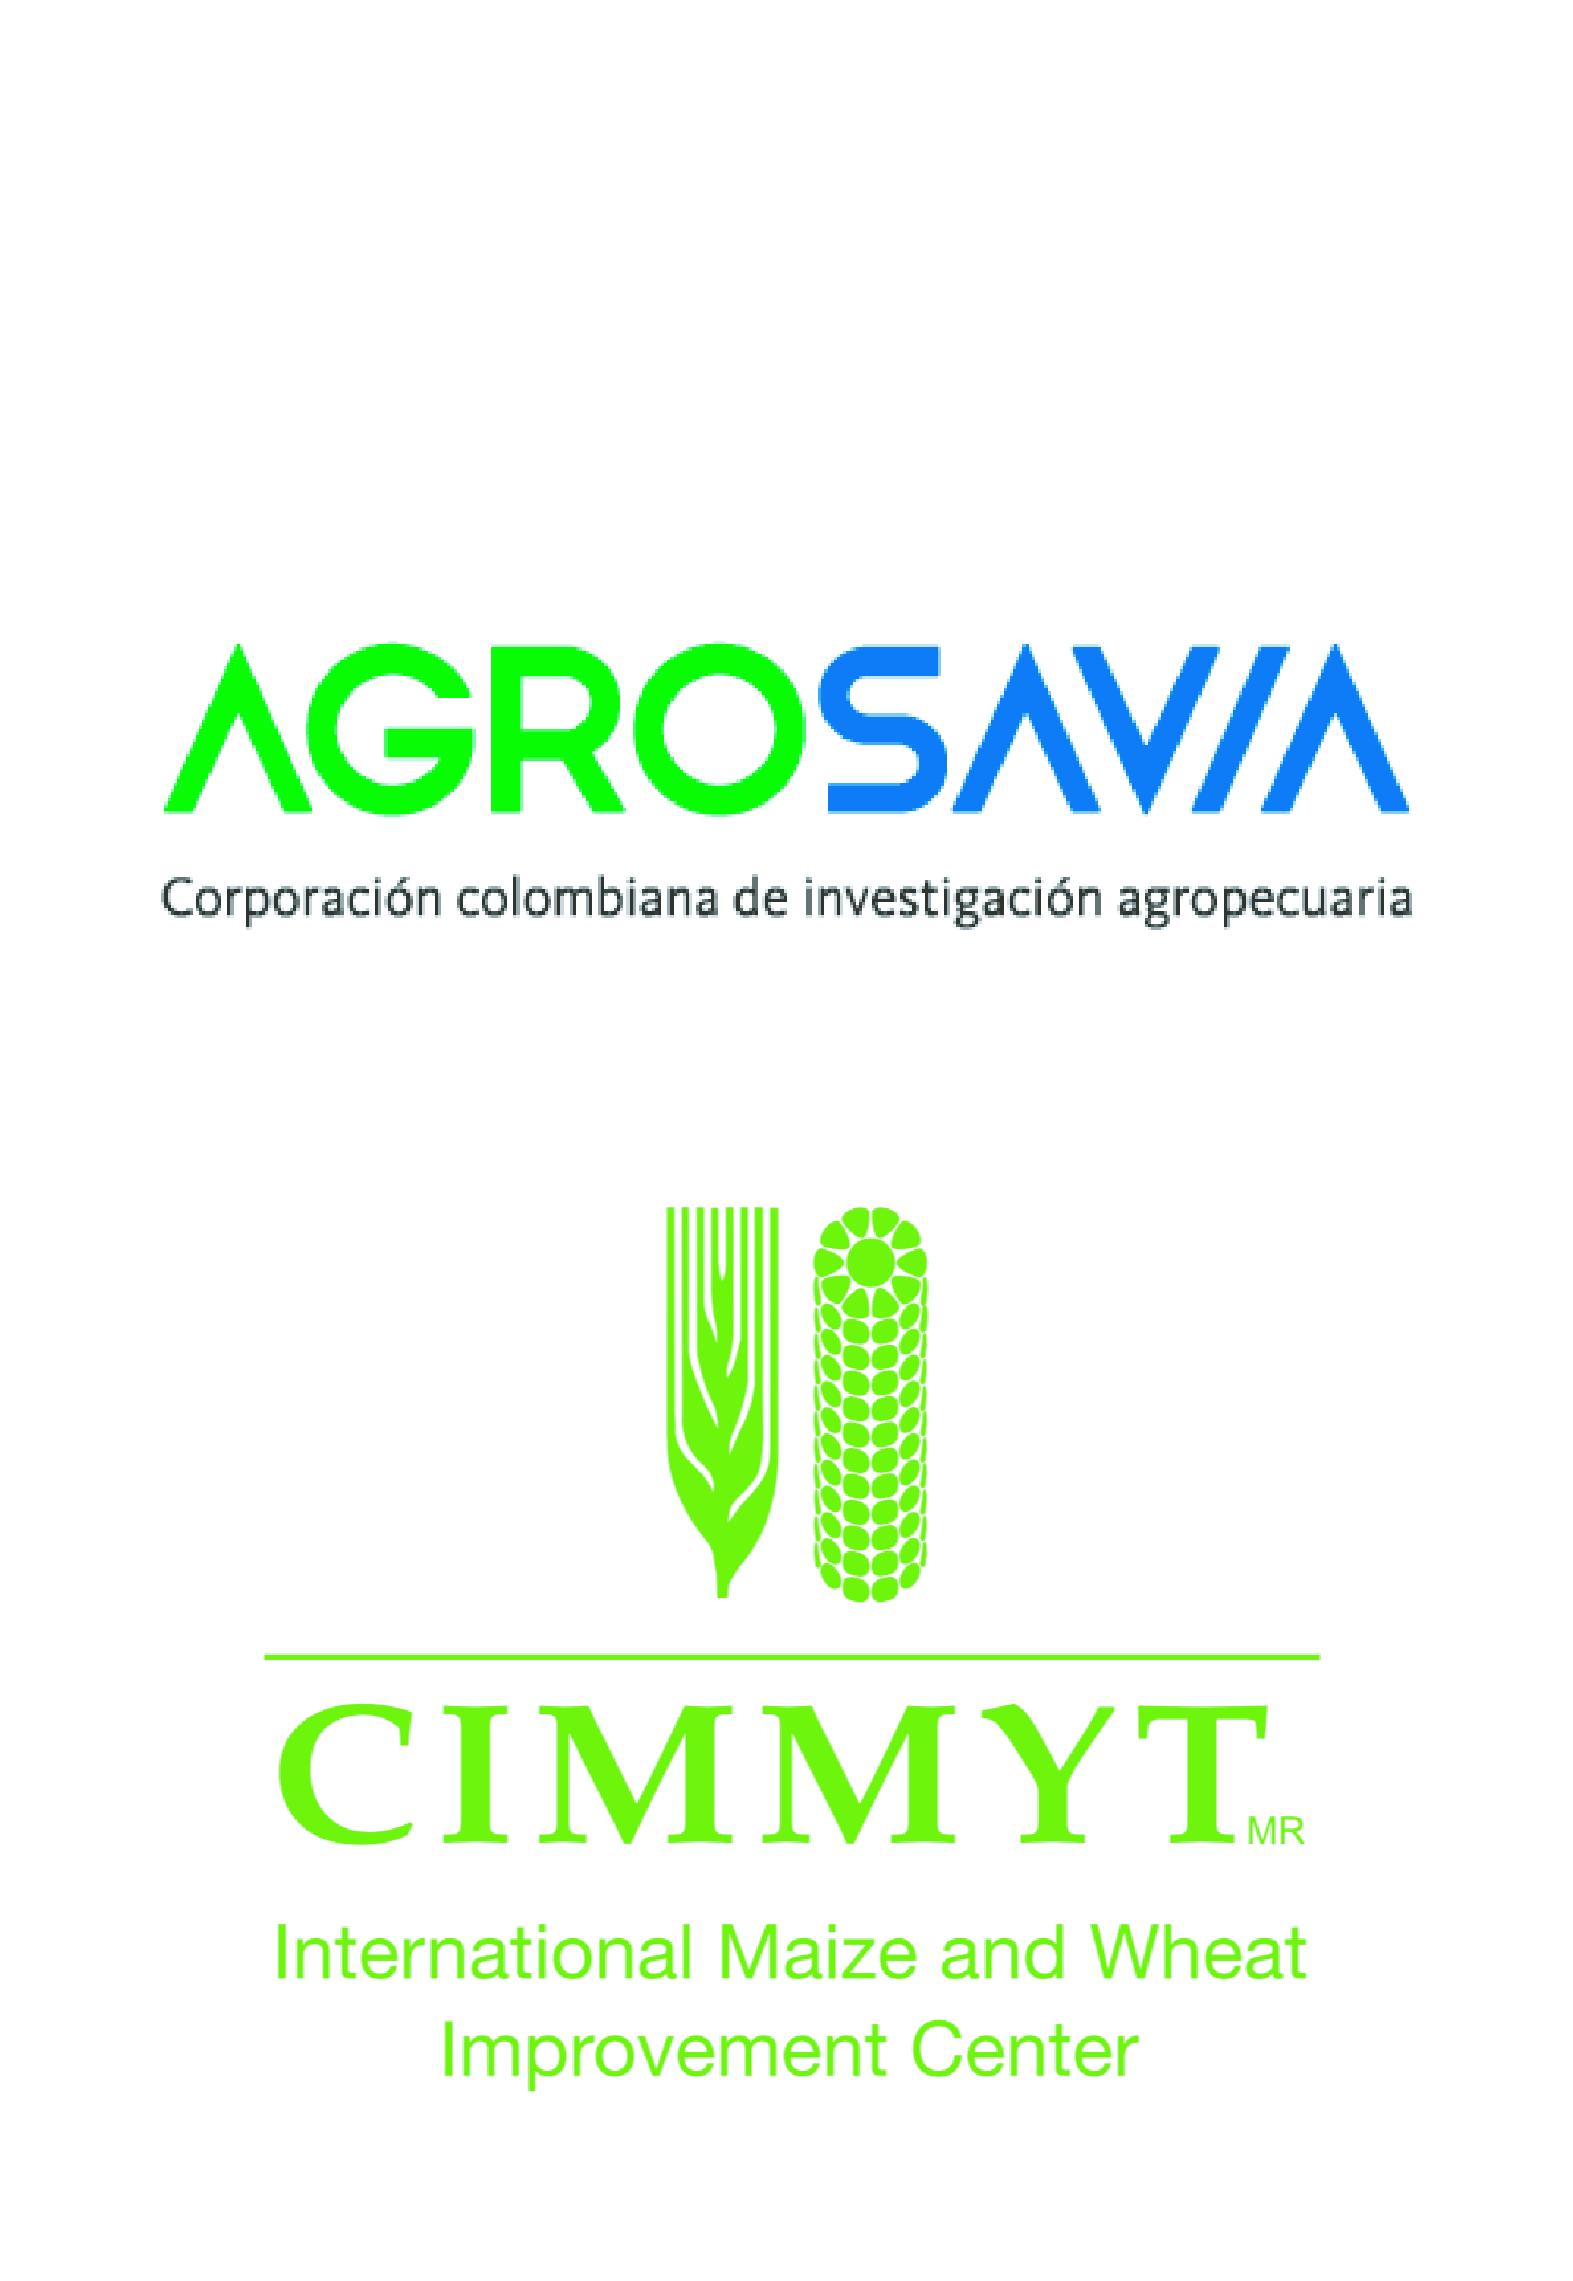 Agrosavia + CIMMYT